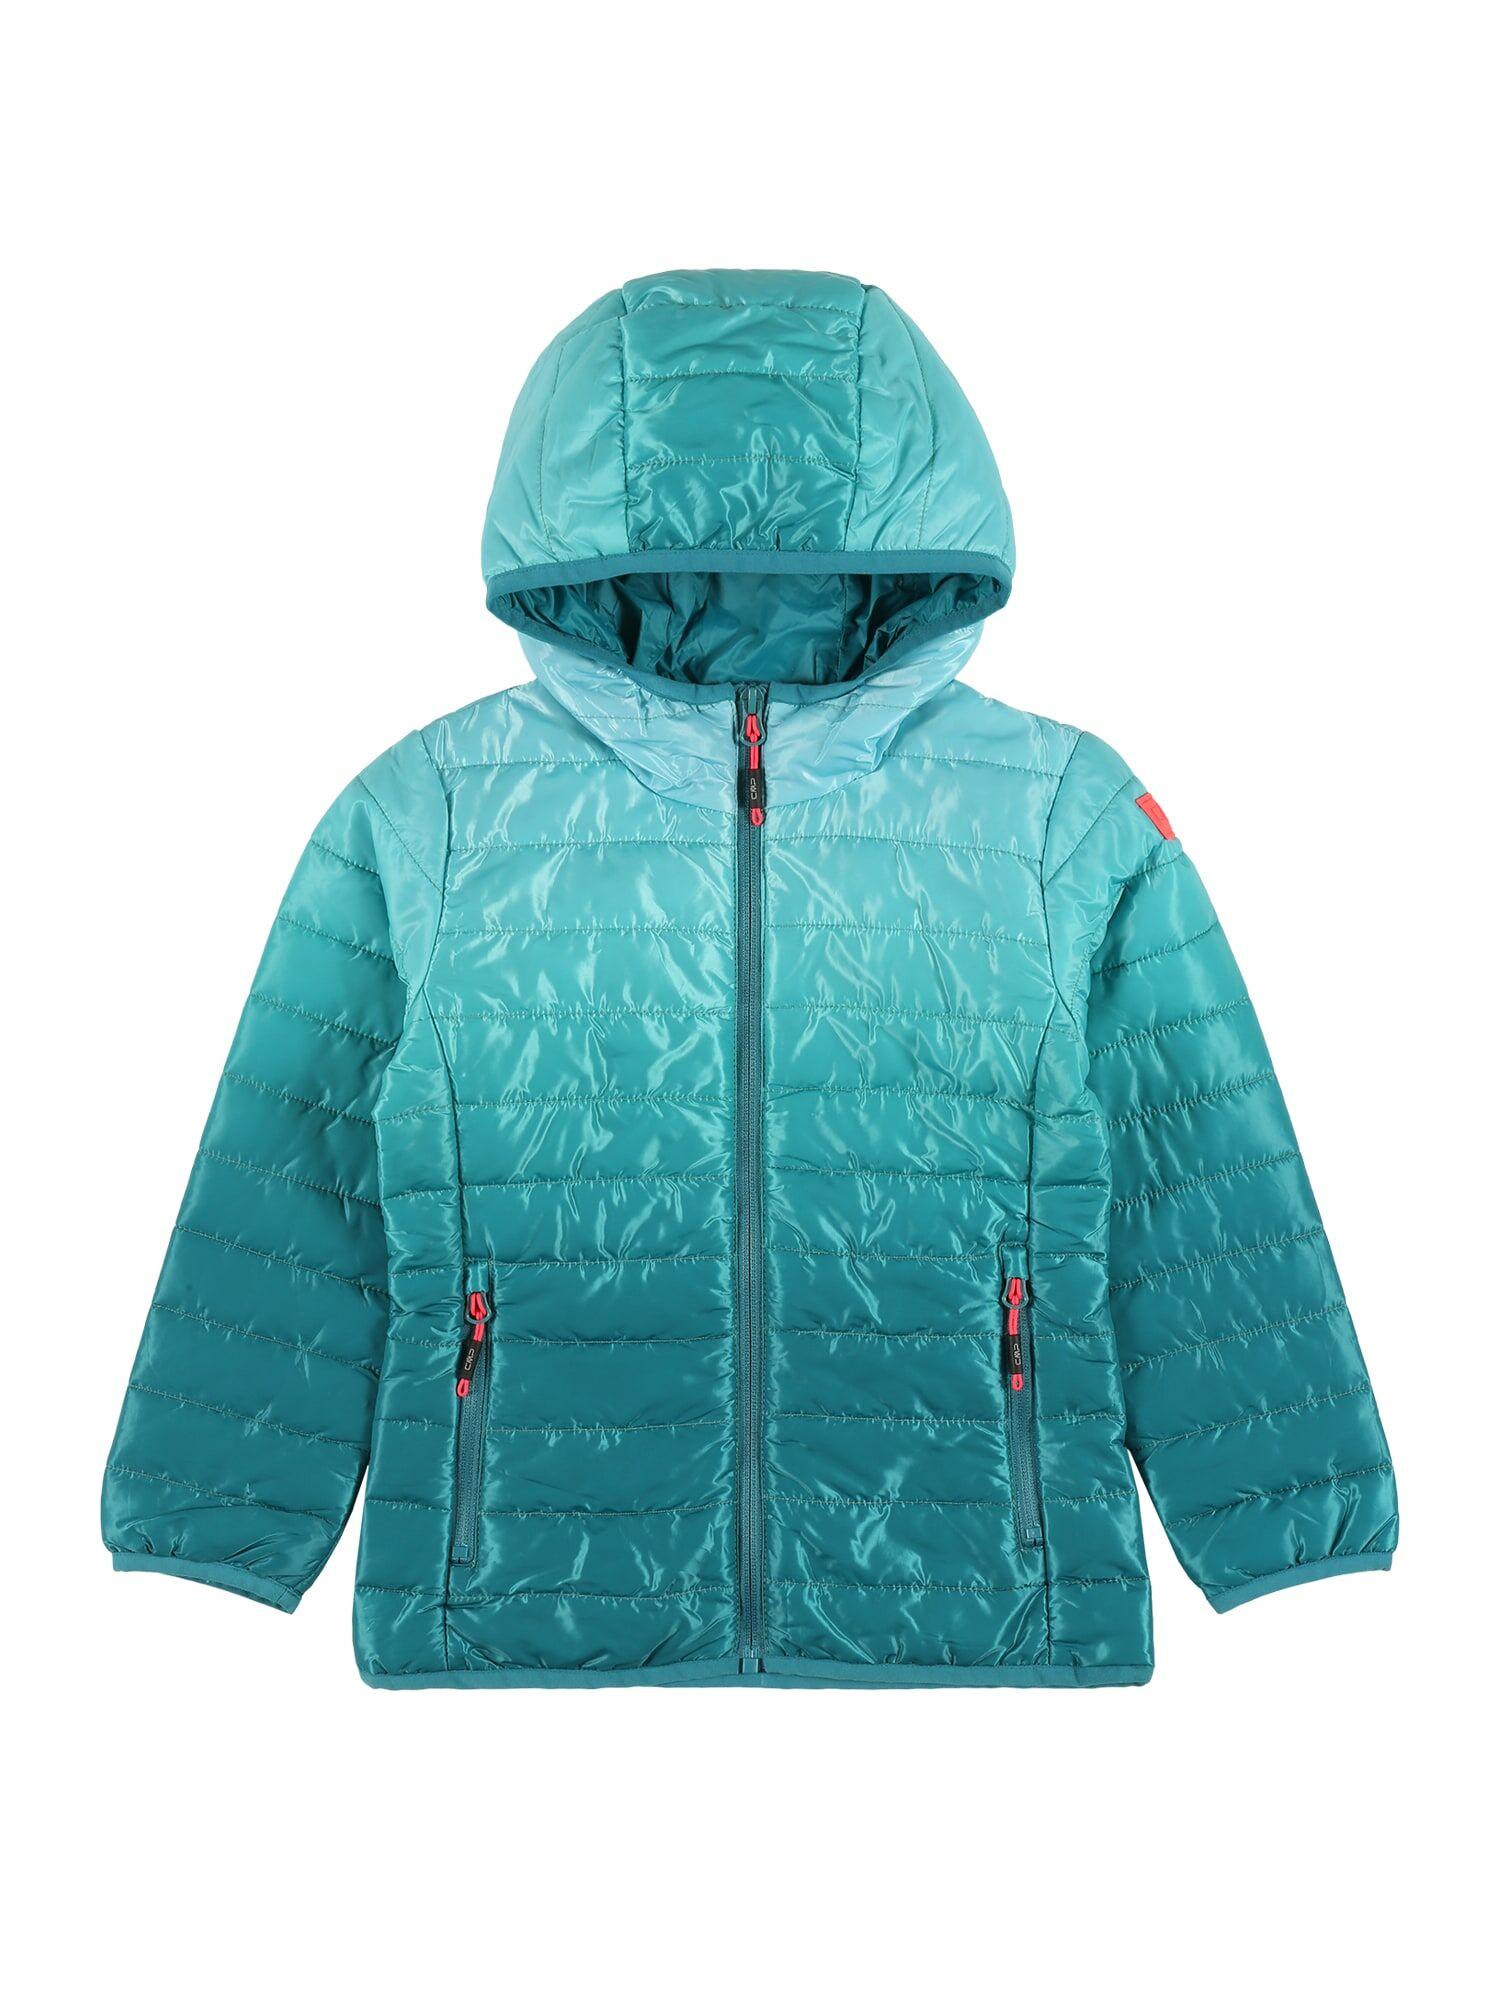 CMP Veste outdoor  - Vert - Taille: 176 - boy